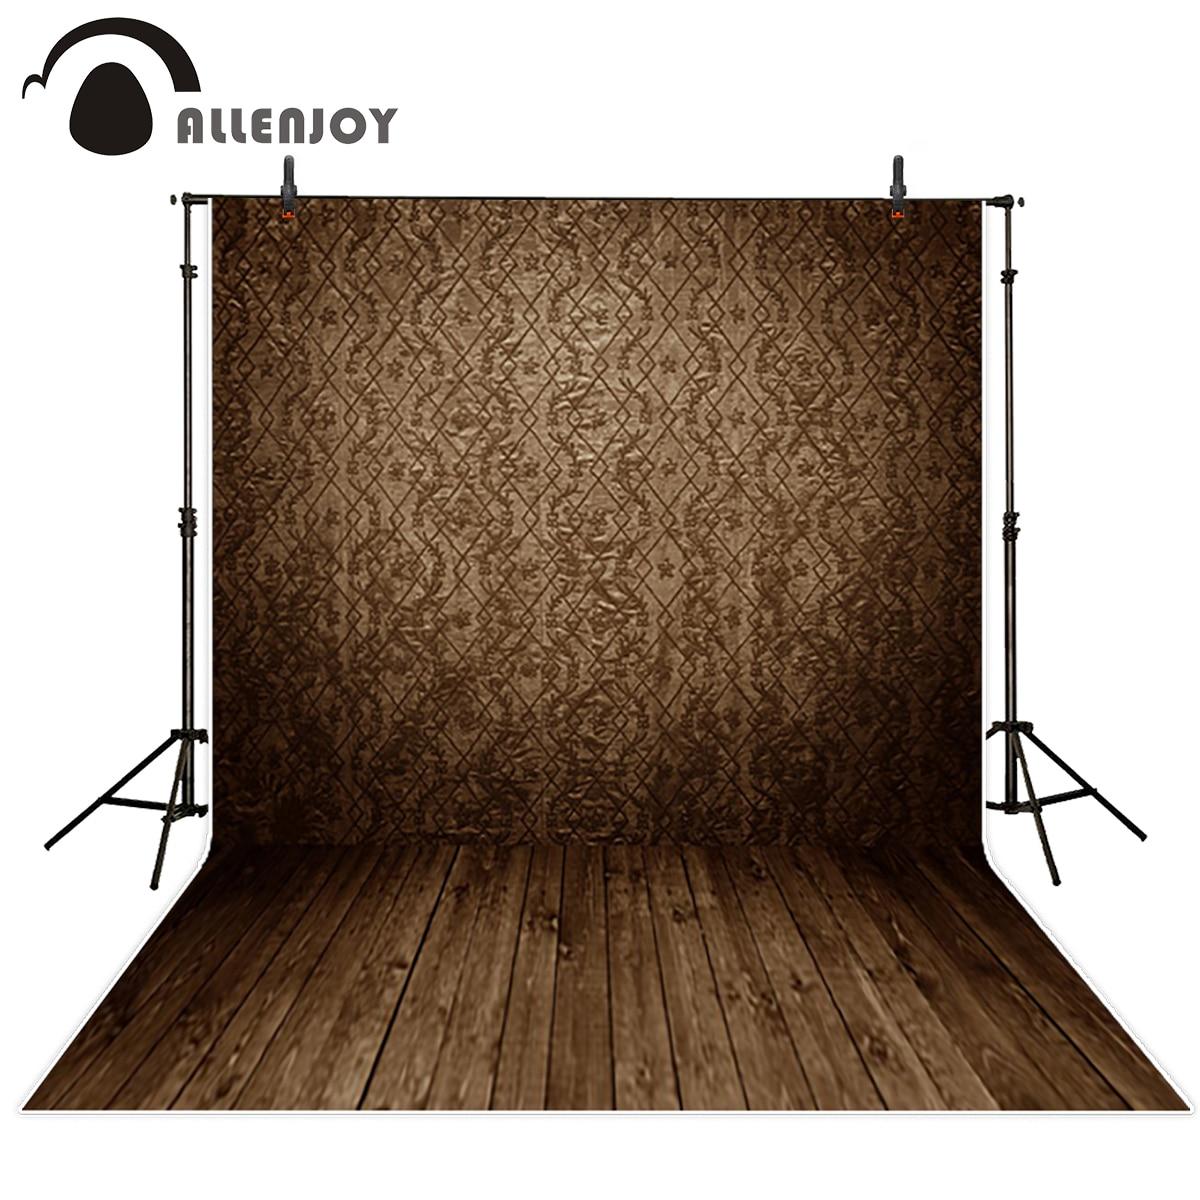 Allenjoy photography backdrop brown damask wall wood floor vintage background professional fabric photocall аксессуар защитная пленка alcatel onetouch pop d5 5038d media gadget premium антибликовая mg997